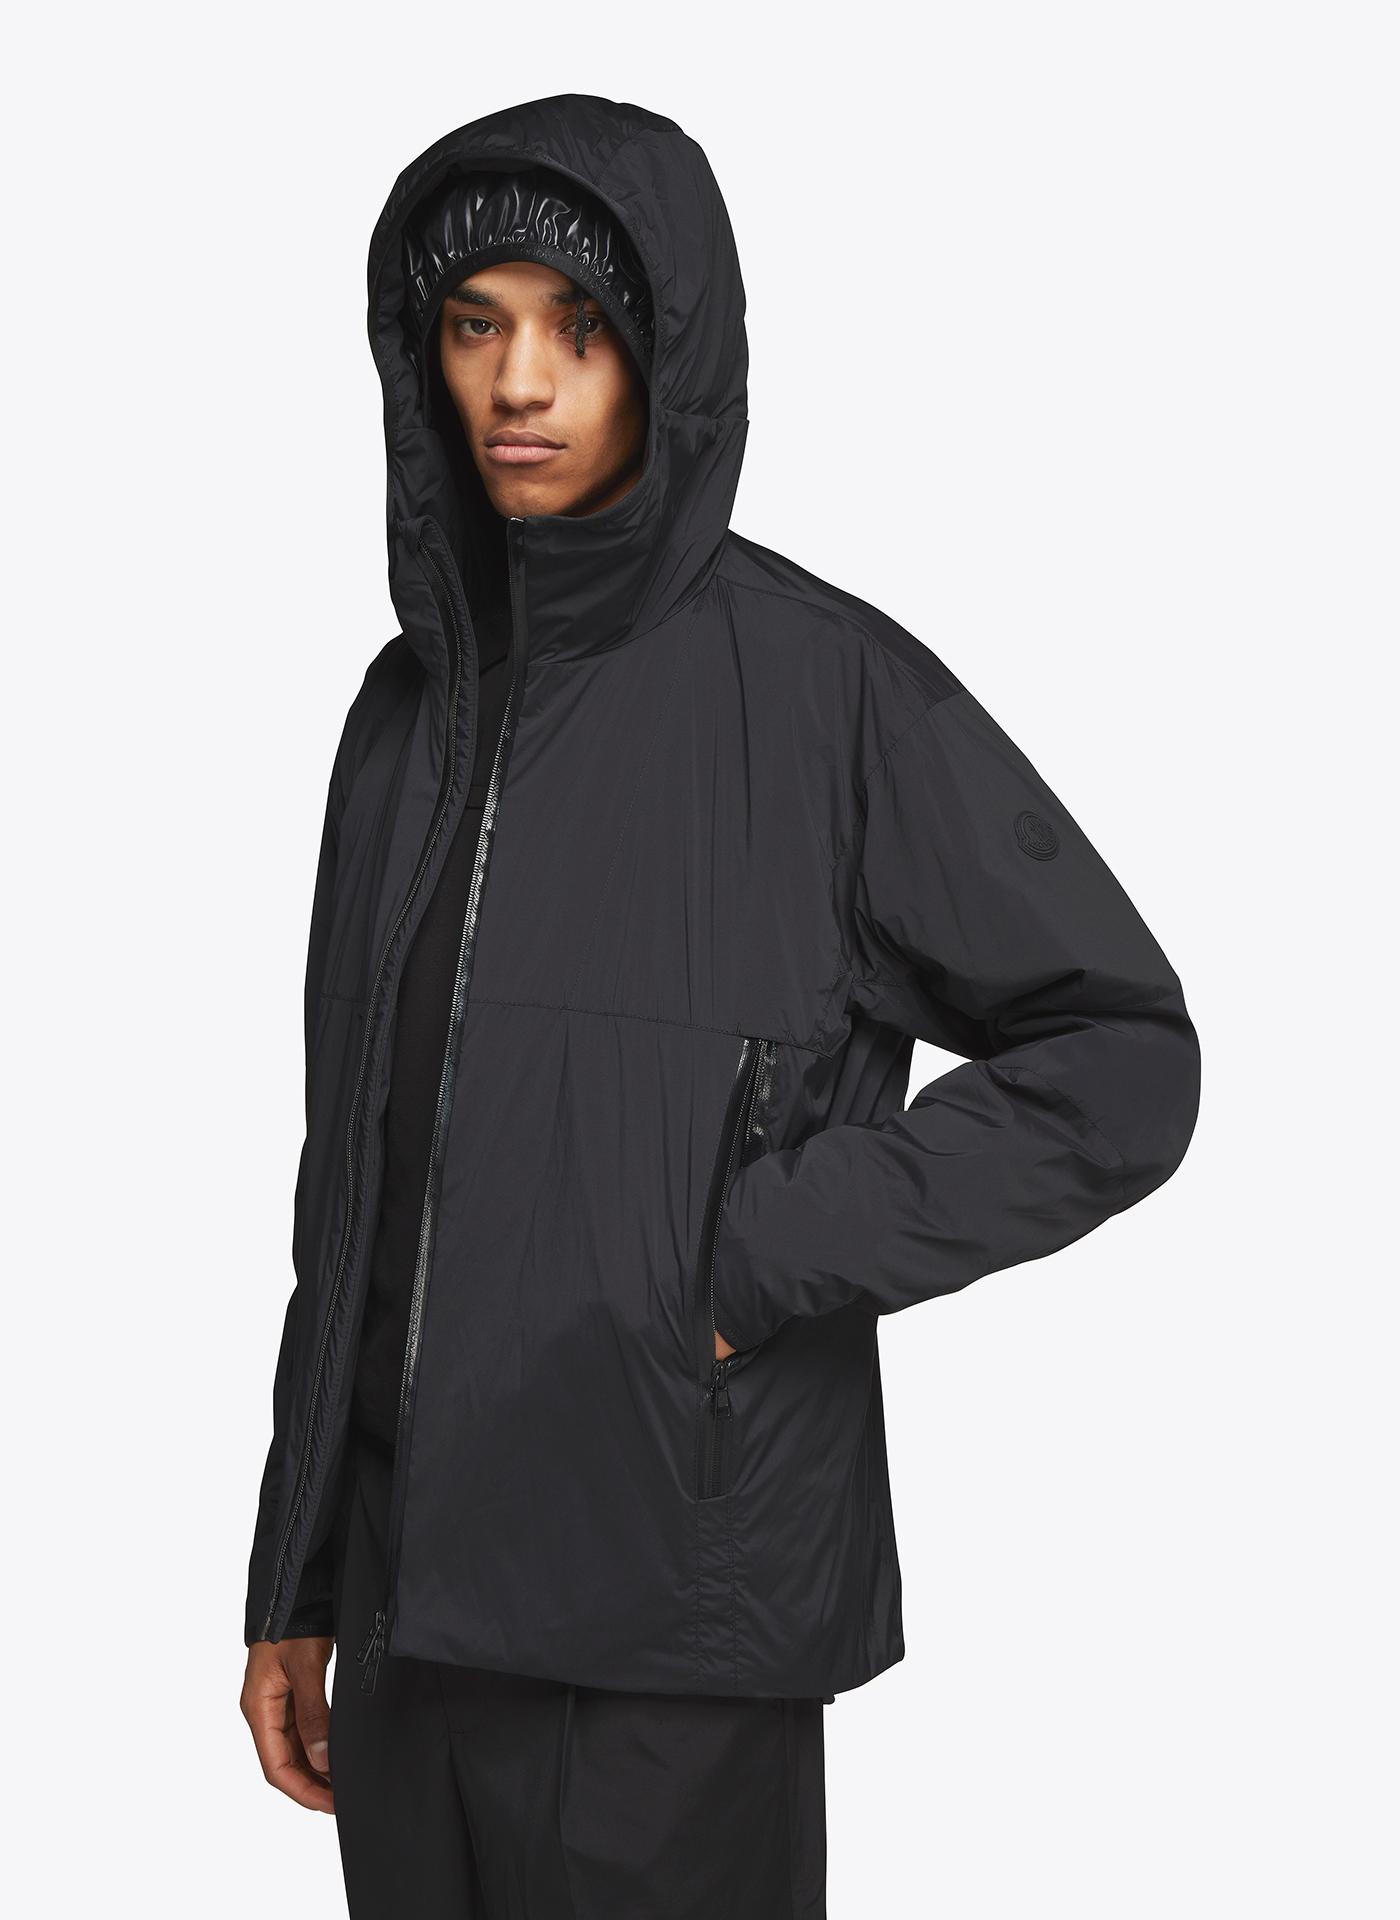 menswear model wearing dark blue coat with hoodie on